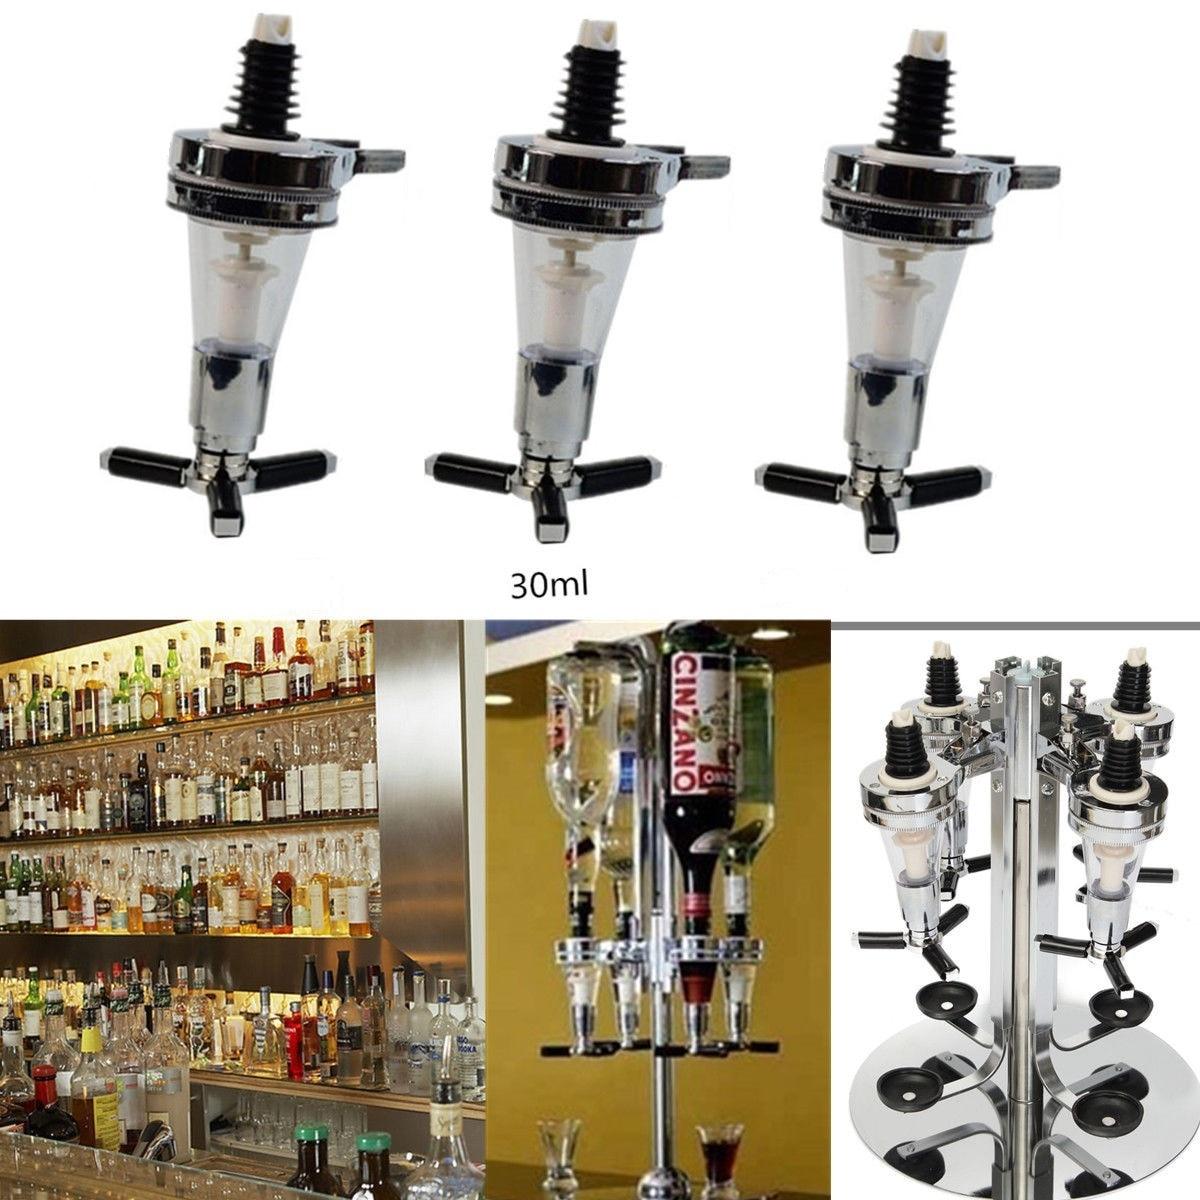 Dispensador de bebidas alcohólicas para vino o cócteles montado en la pared